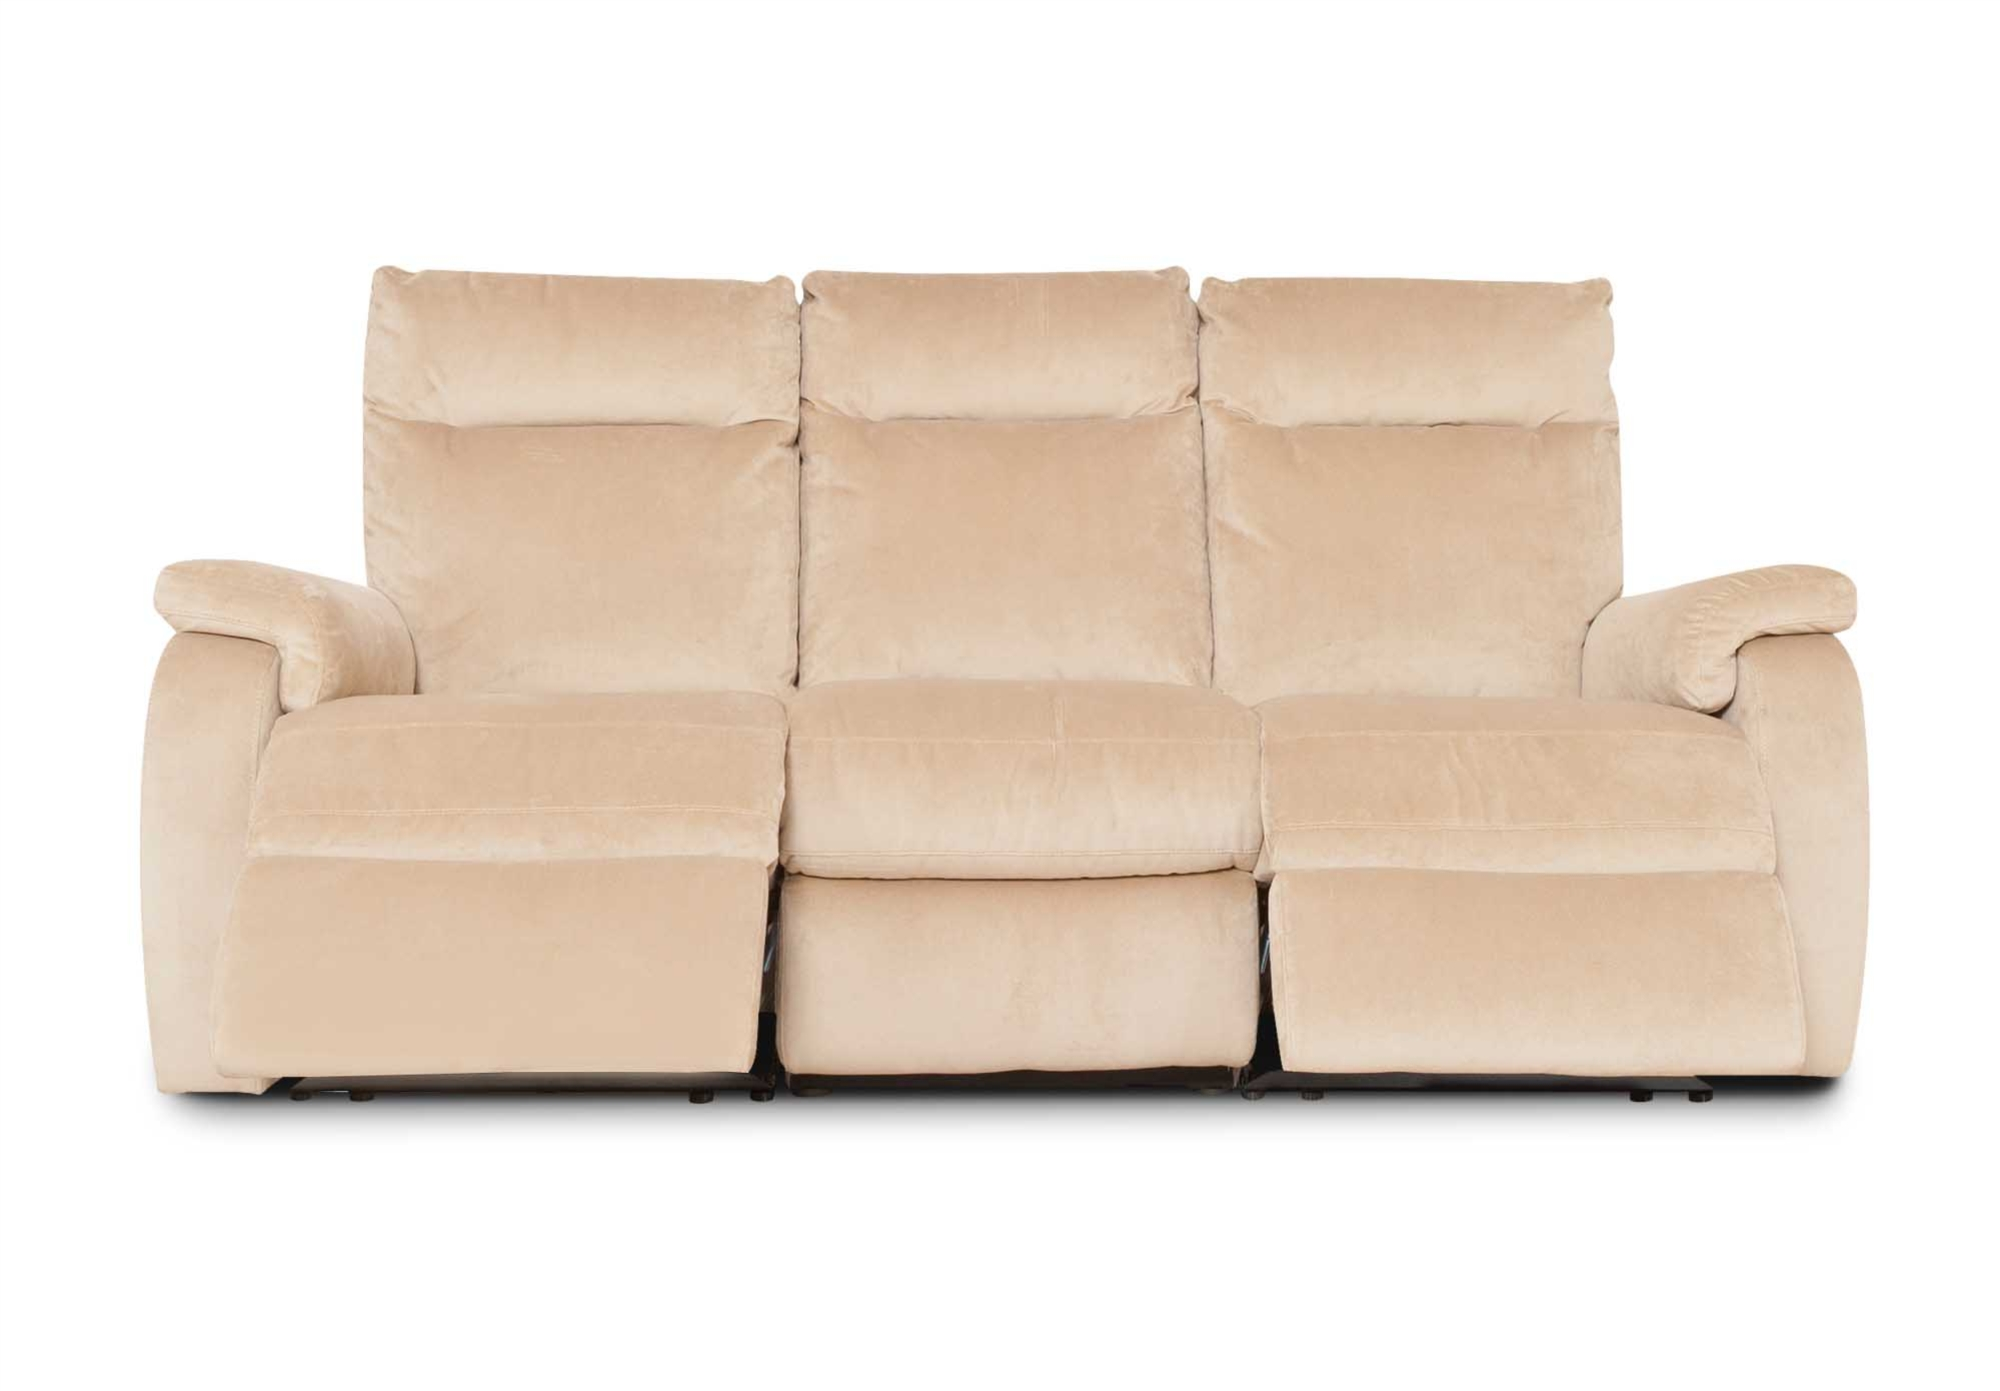 domicil sofa review unwind domicil leather reclining 3 seat sofa theater seats thesofa. Black Bedroom Furniture Sets. Home Design Ideas